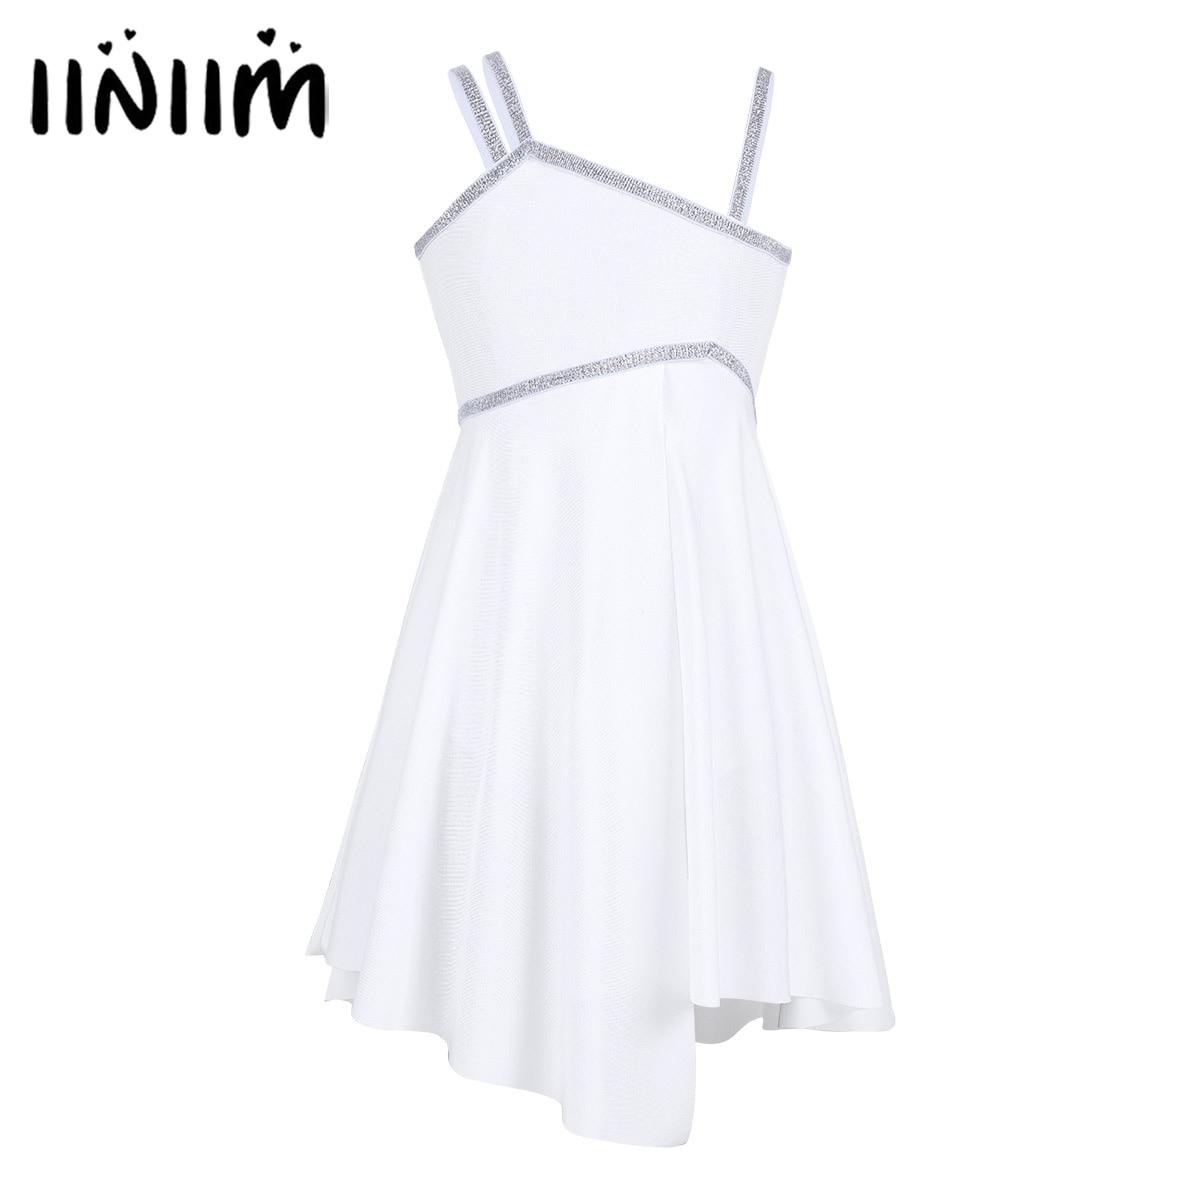 Kid Girls Ballet Leotard Dance Dress Tutu Gymnastics Dancewear Costume Size 4-14